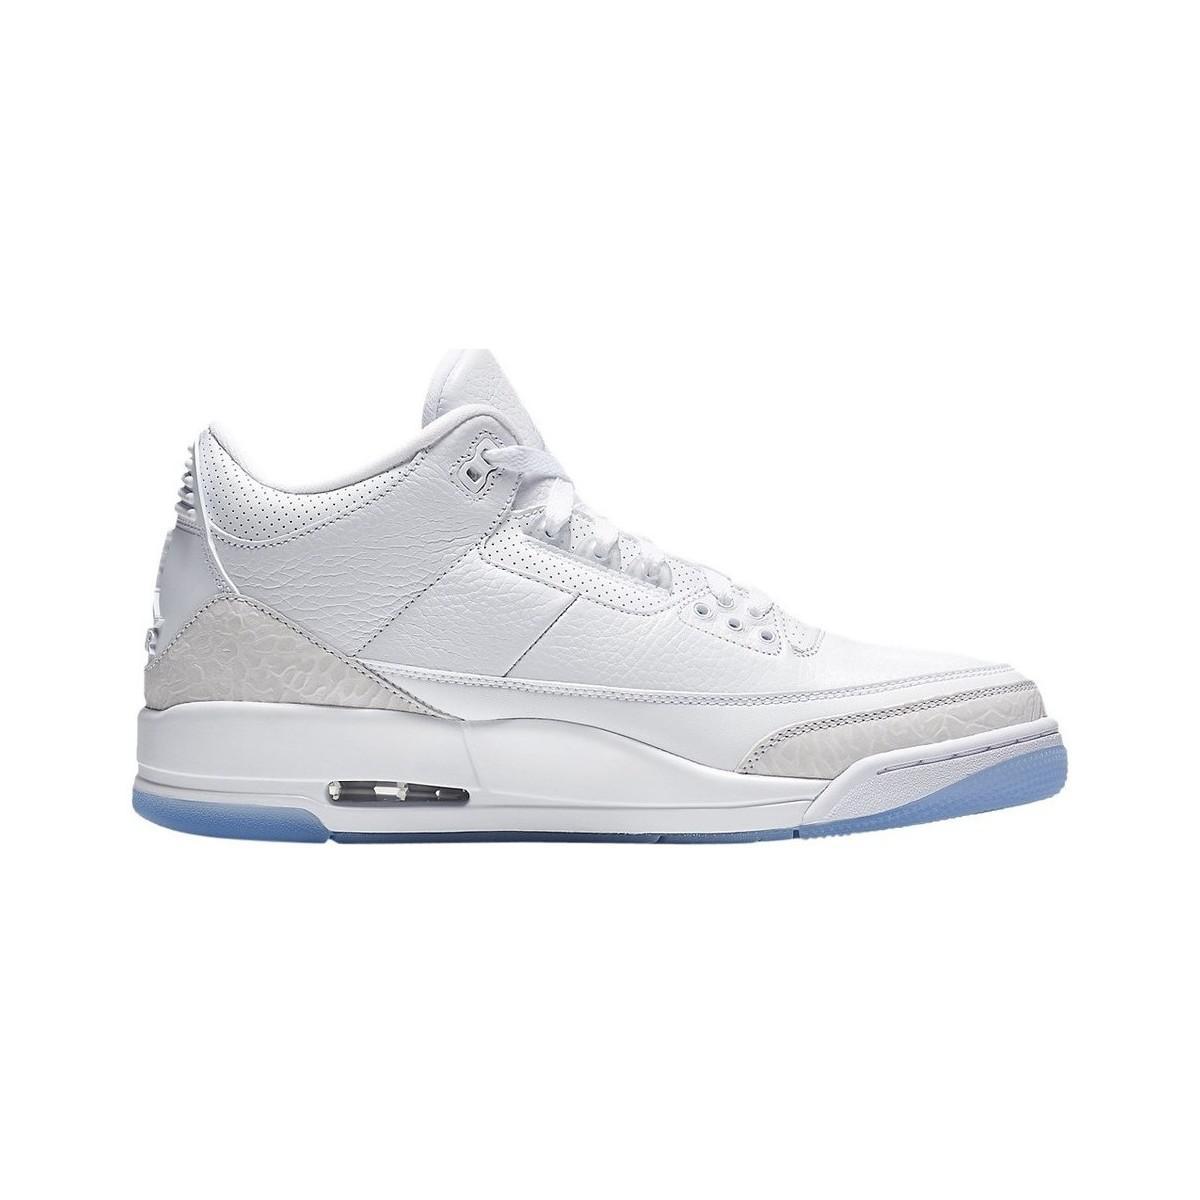 b49e4c3fa04 Nike Air Jordan 3 Retro Men s Shoes (high-top Trainers) In White in ...